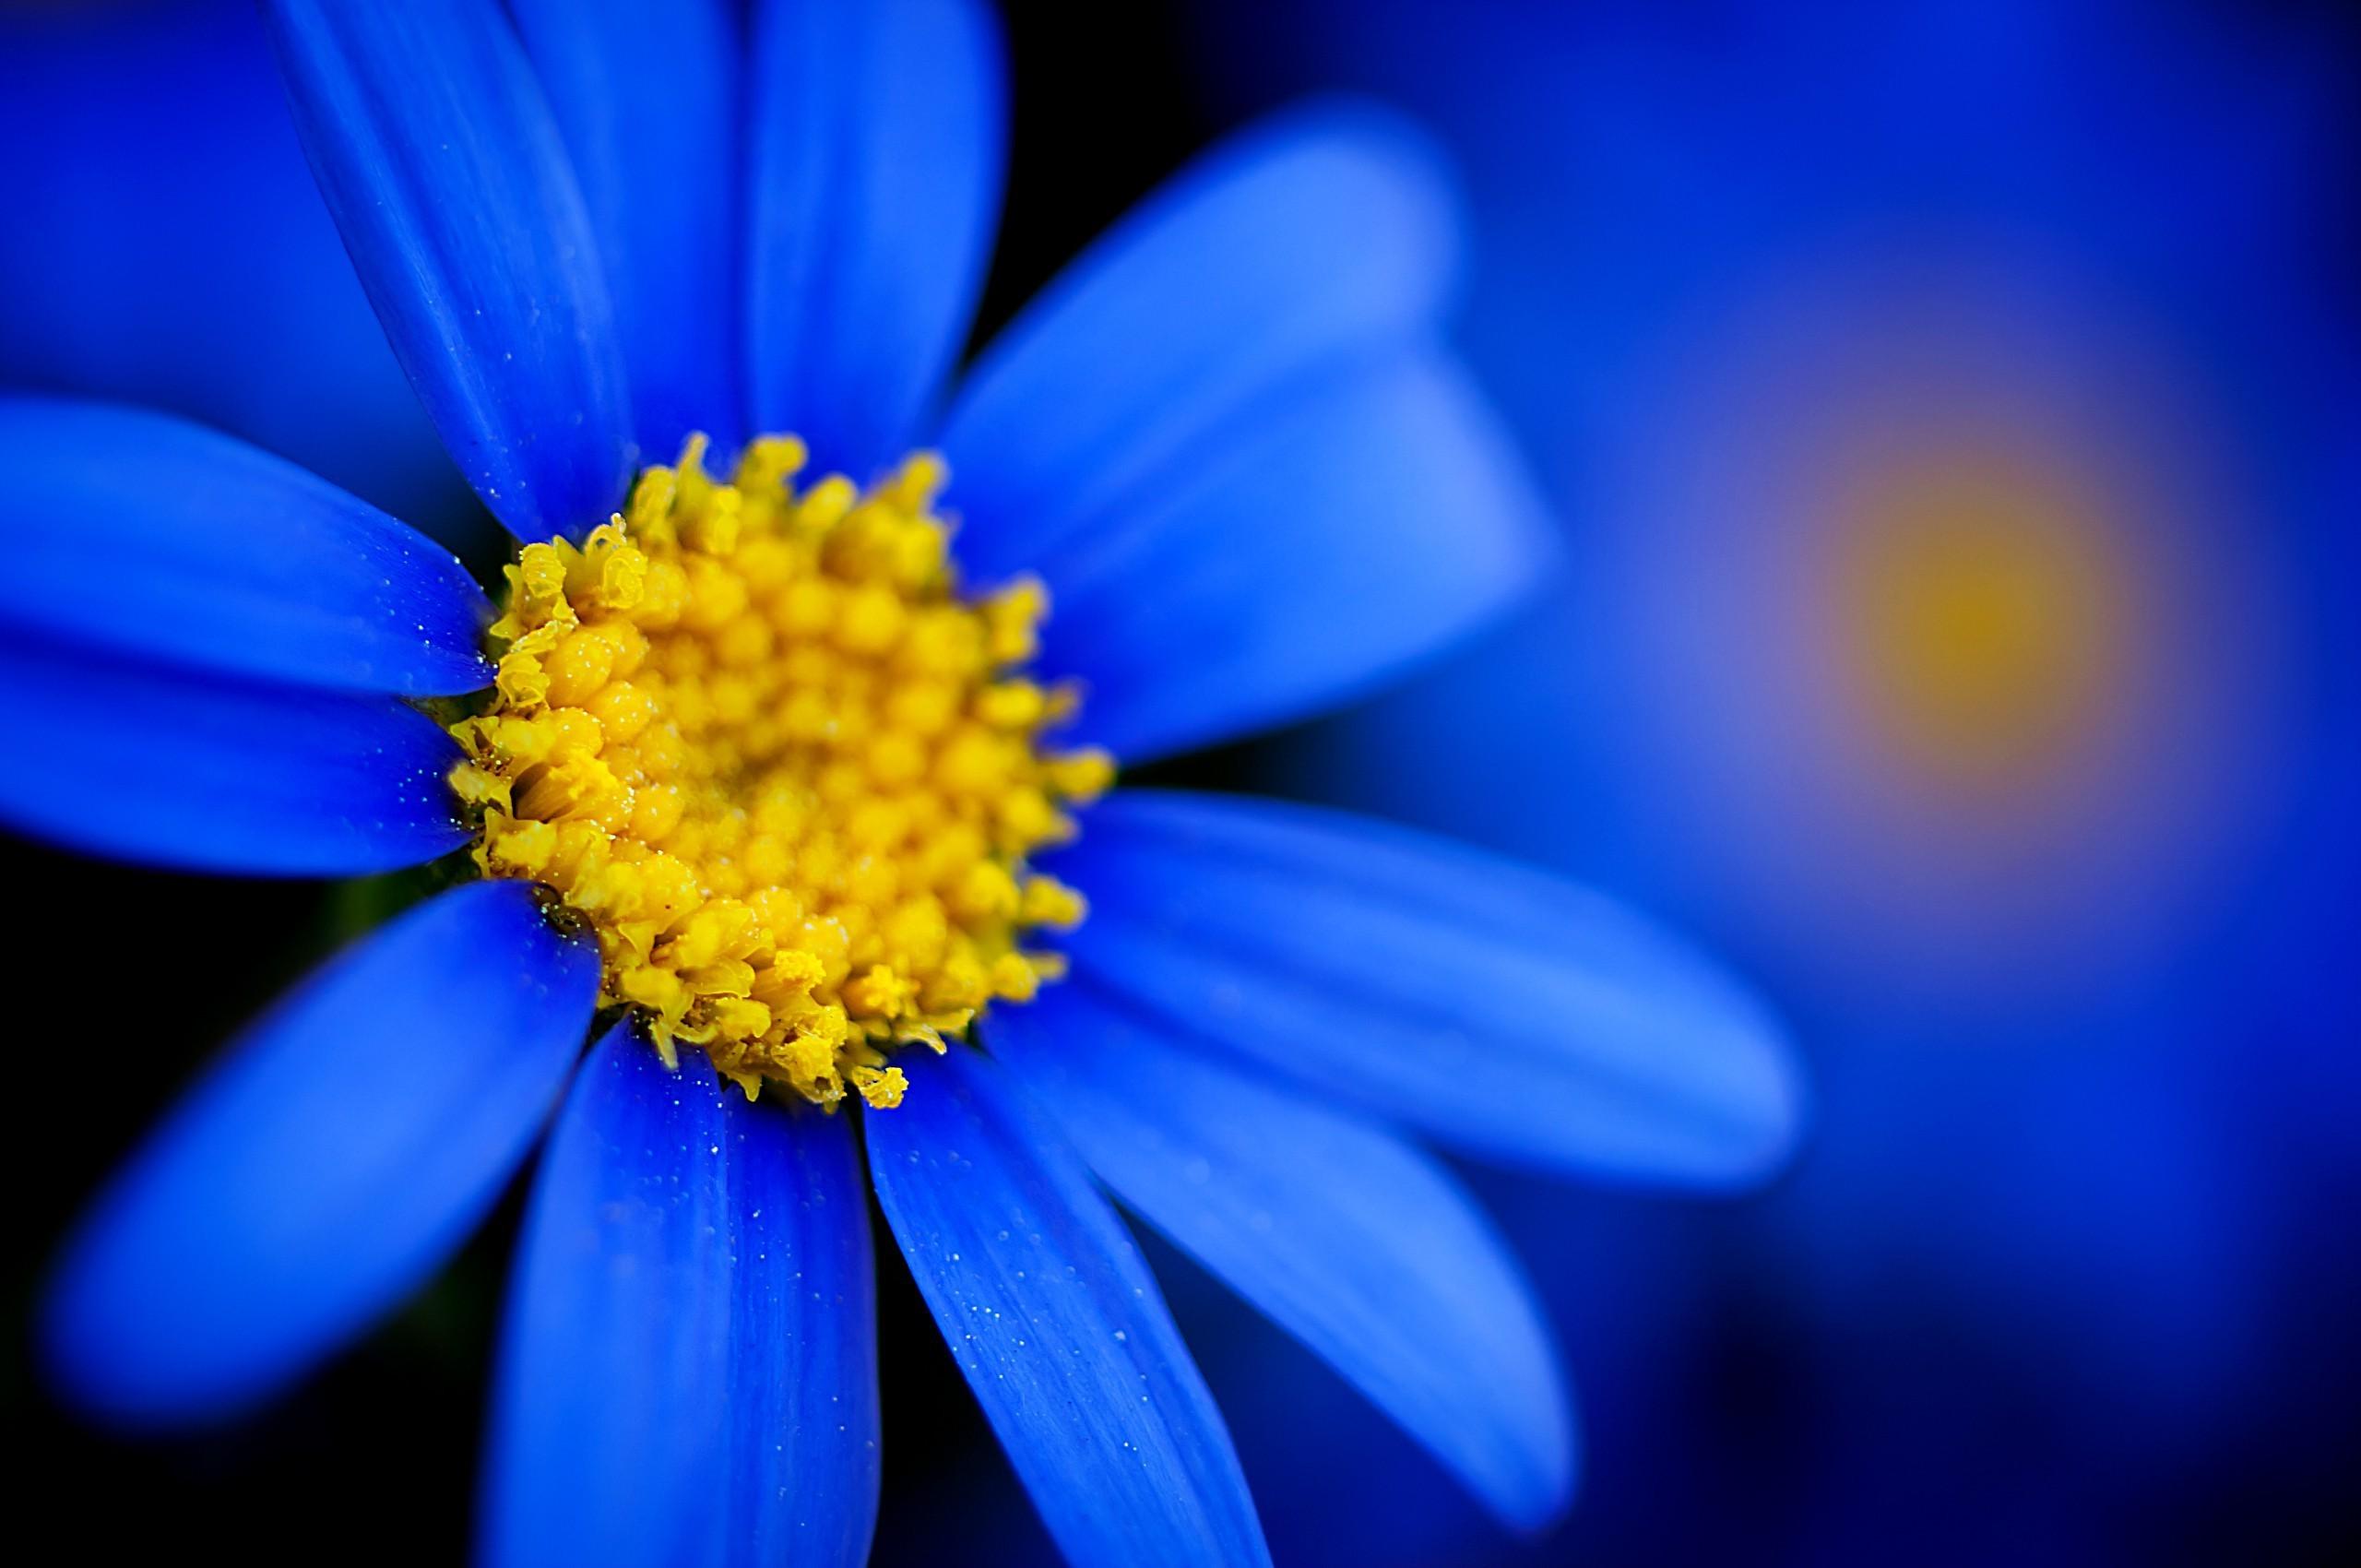 24+ Blue Flower Wallpaper Hd Download Images